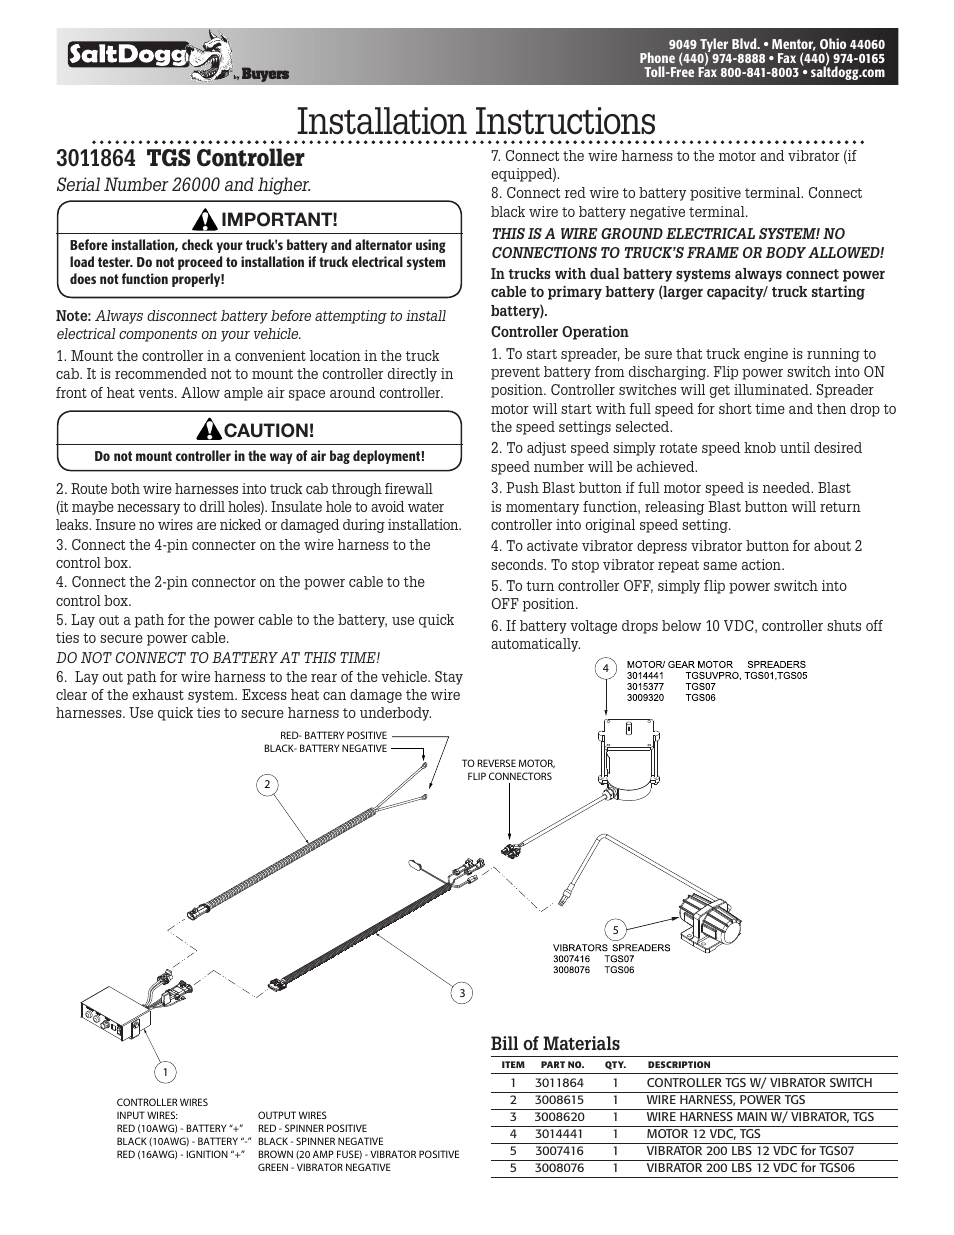 medium resolution of saltdogg tgs controller 3011864 tgsuvproa tgs01b tgs03 tgs05b rh manualsdir com basic electrical wiring diagrams plc